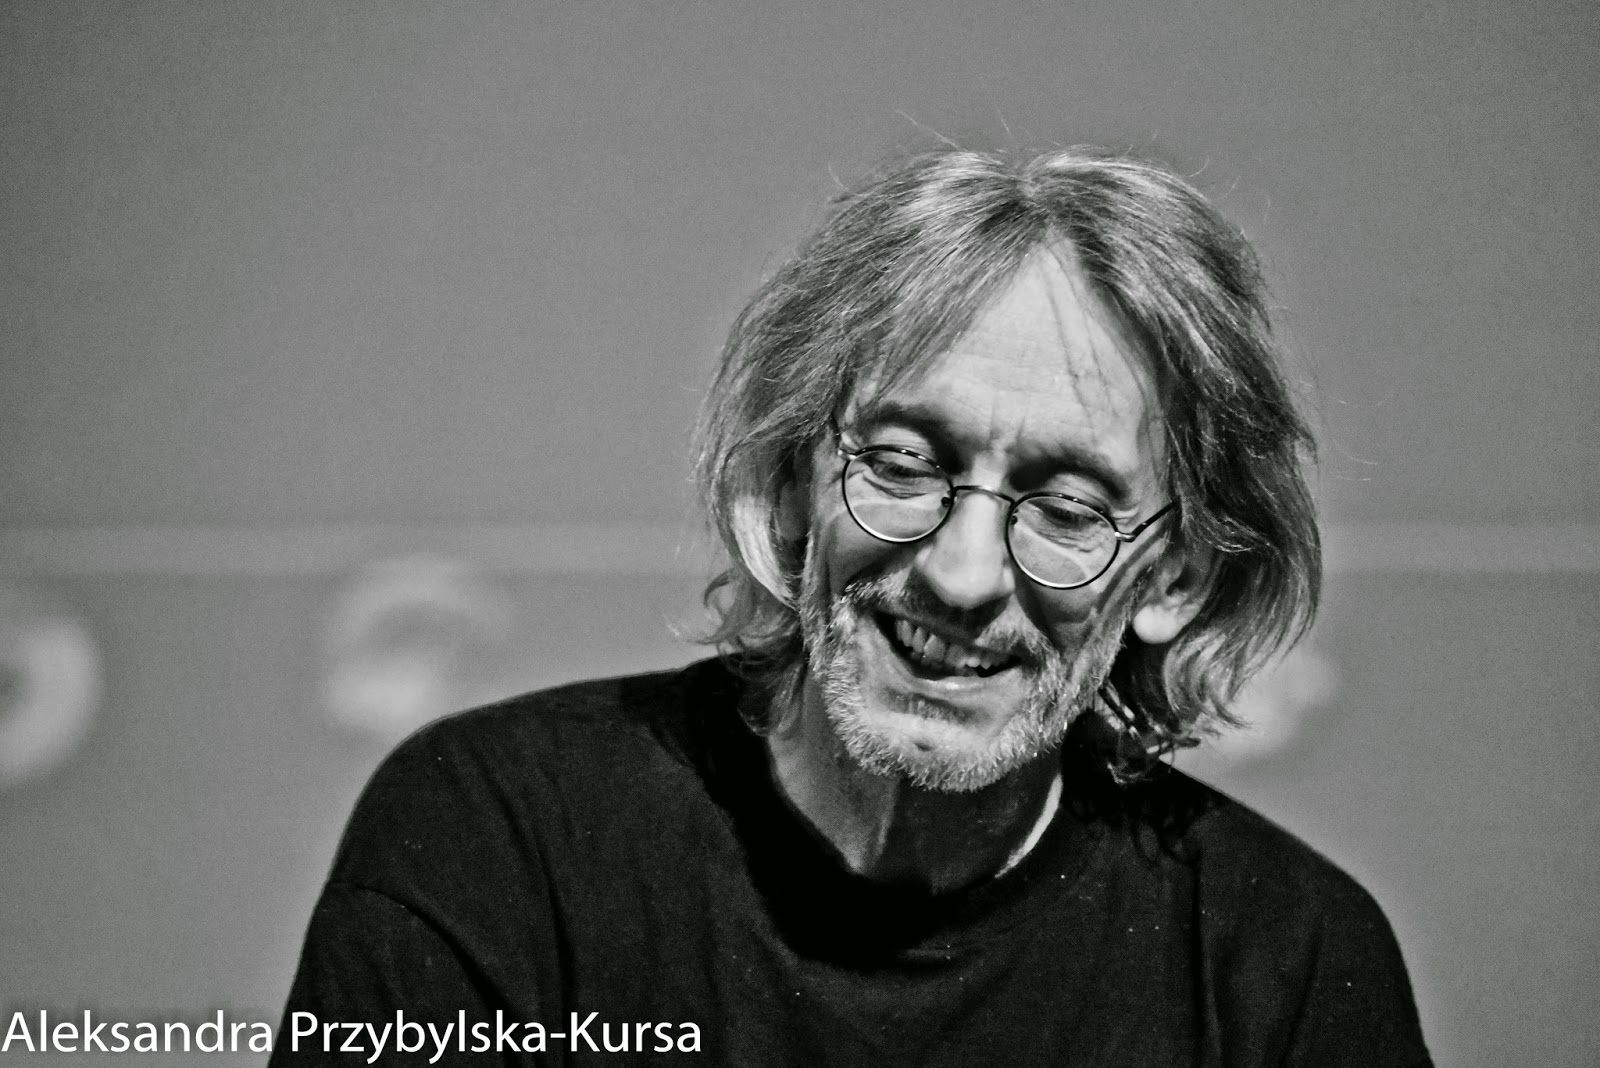 Manuel Göttsching live @ E-Live 2014 / photo : Aleksandra Przybylska-Kursa